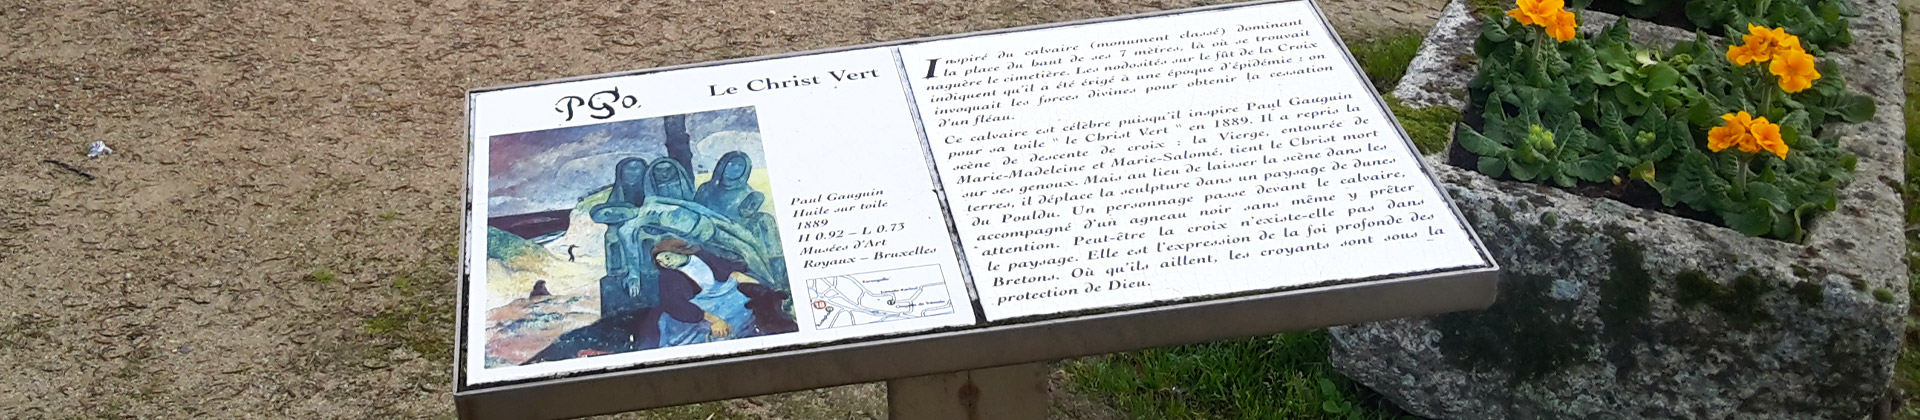 Le Christ vert, œuvre de Paul Gauguin